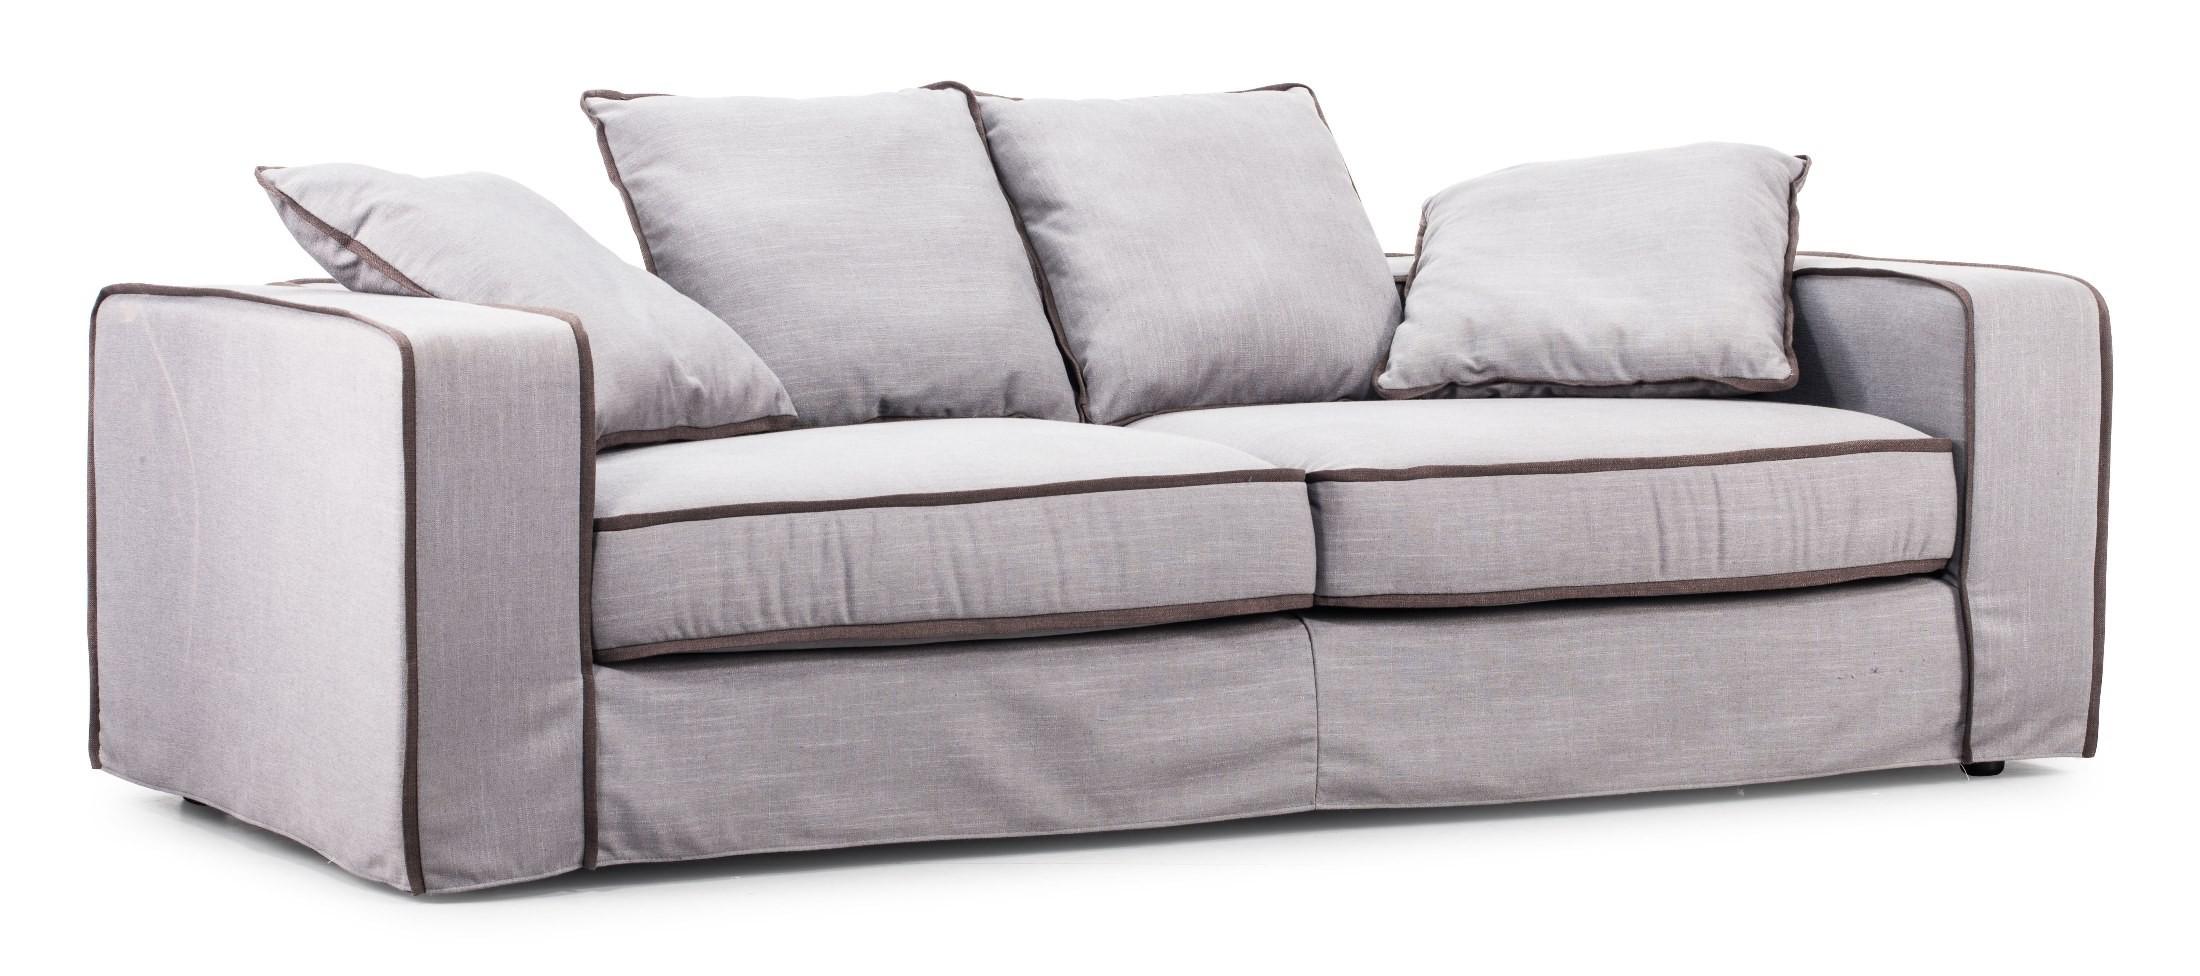 Vasteras Concrete Gray Body Bark Brown Piping Sofa 900611 Zuo Modern